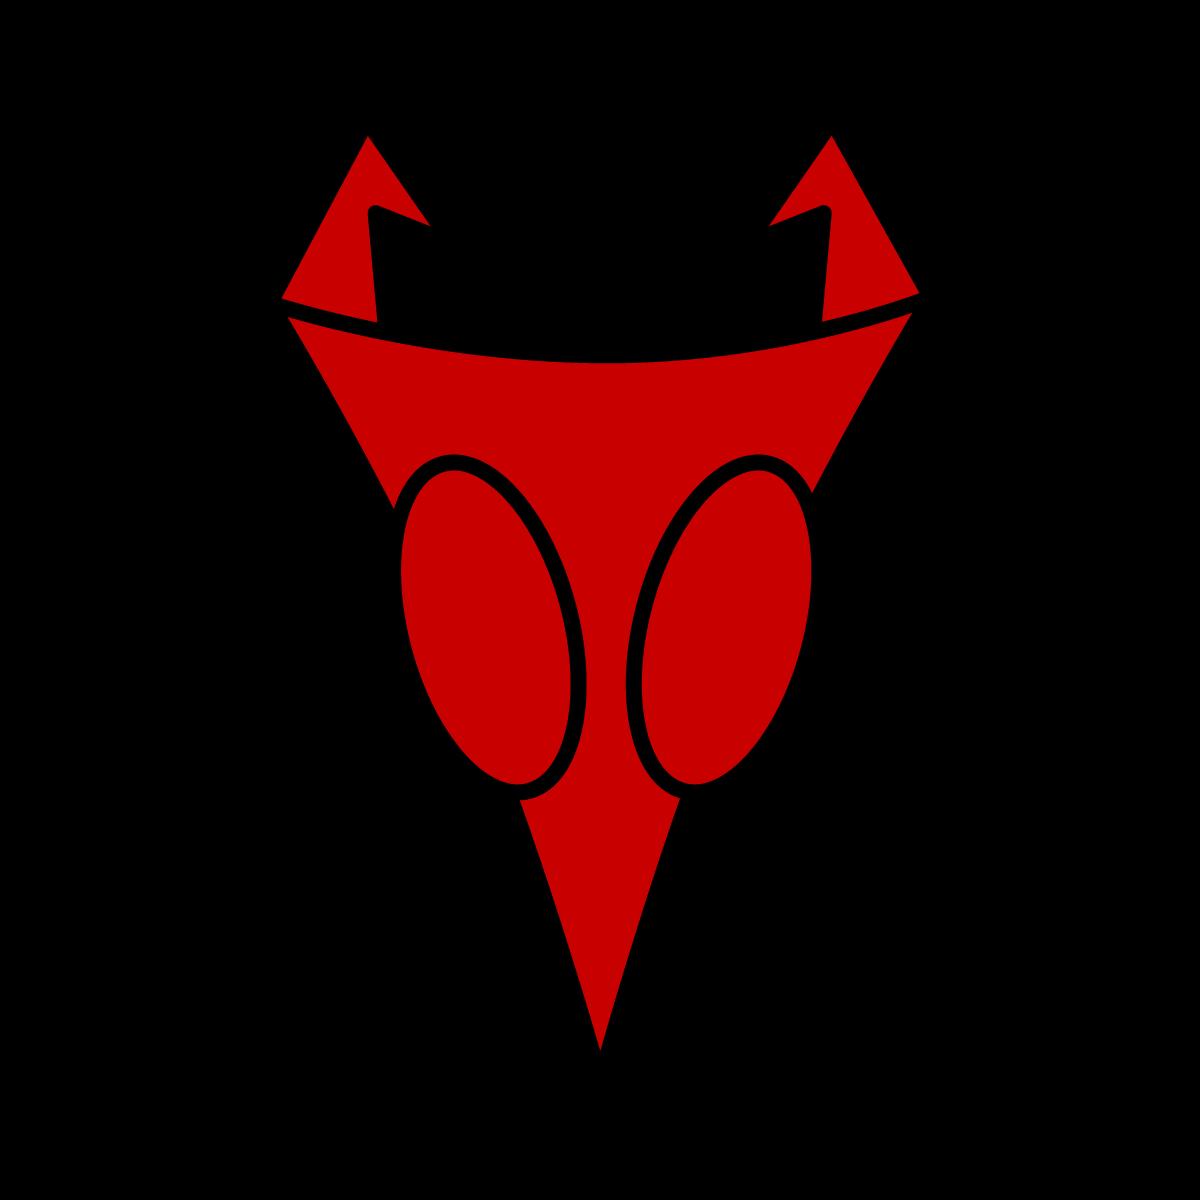 Irken Invader Logo By Danial79 1